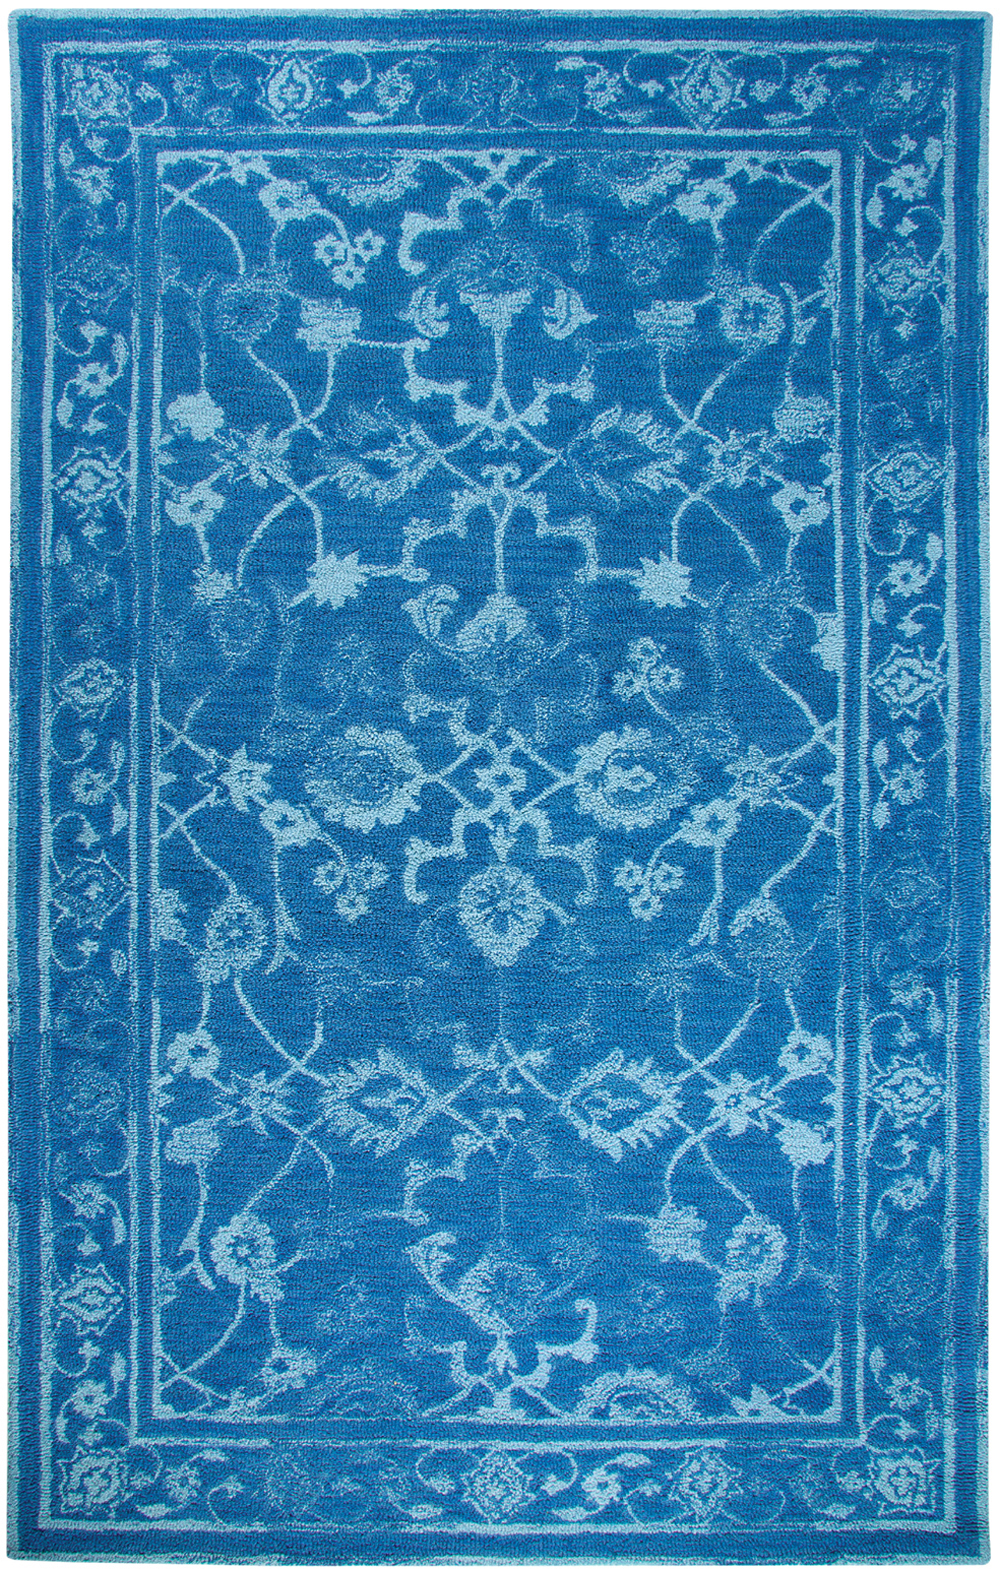 Dynamic AVALON 88802 DK BLUE/LT BLUE Rug